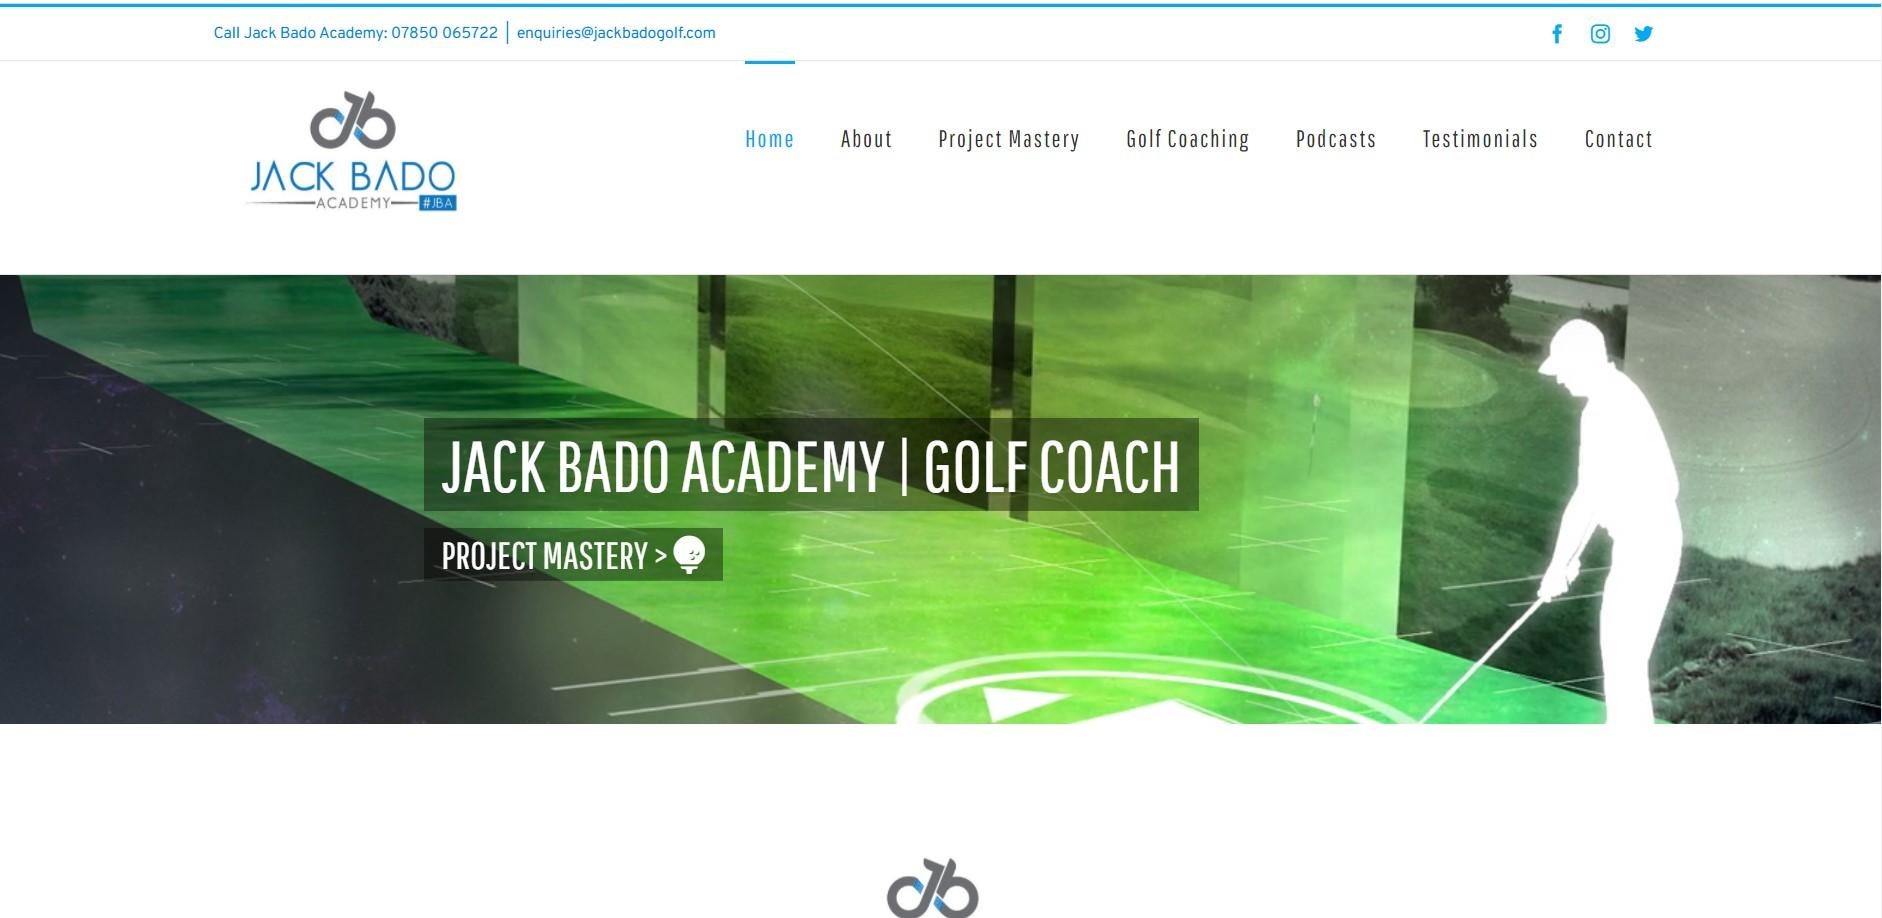 Jack Bado Academy | Golf Coach Sussex